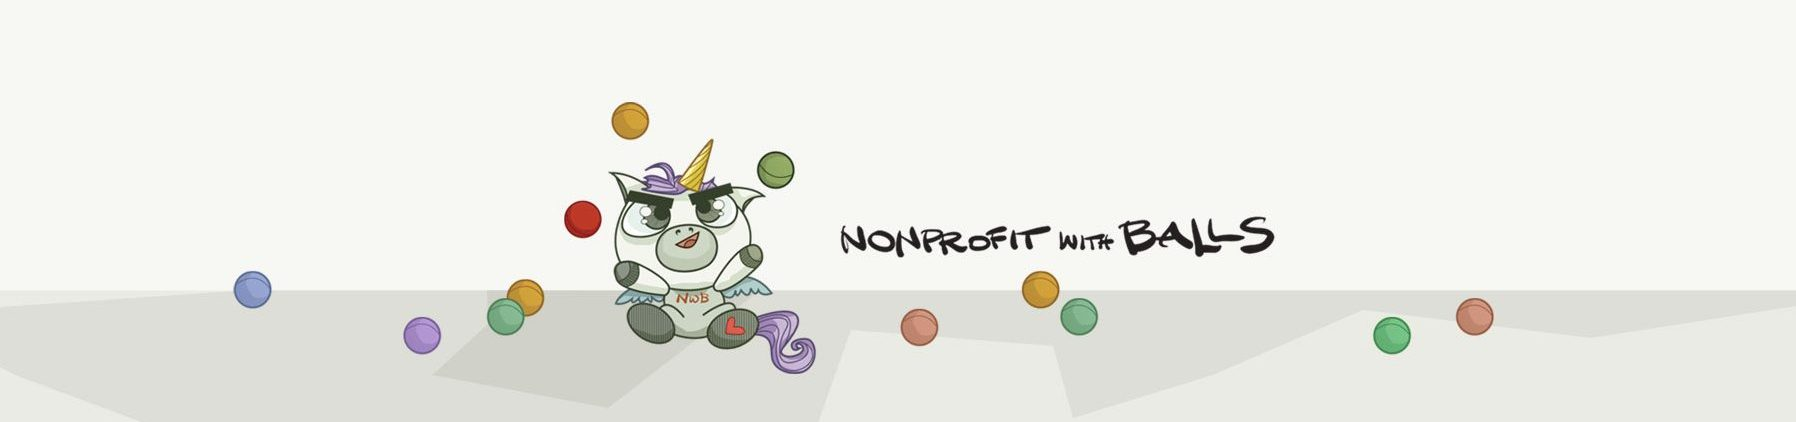 nonprofitwballs.jpg